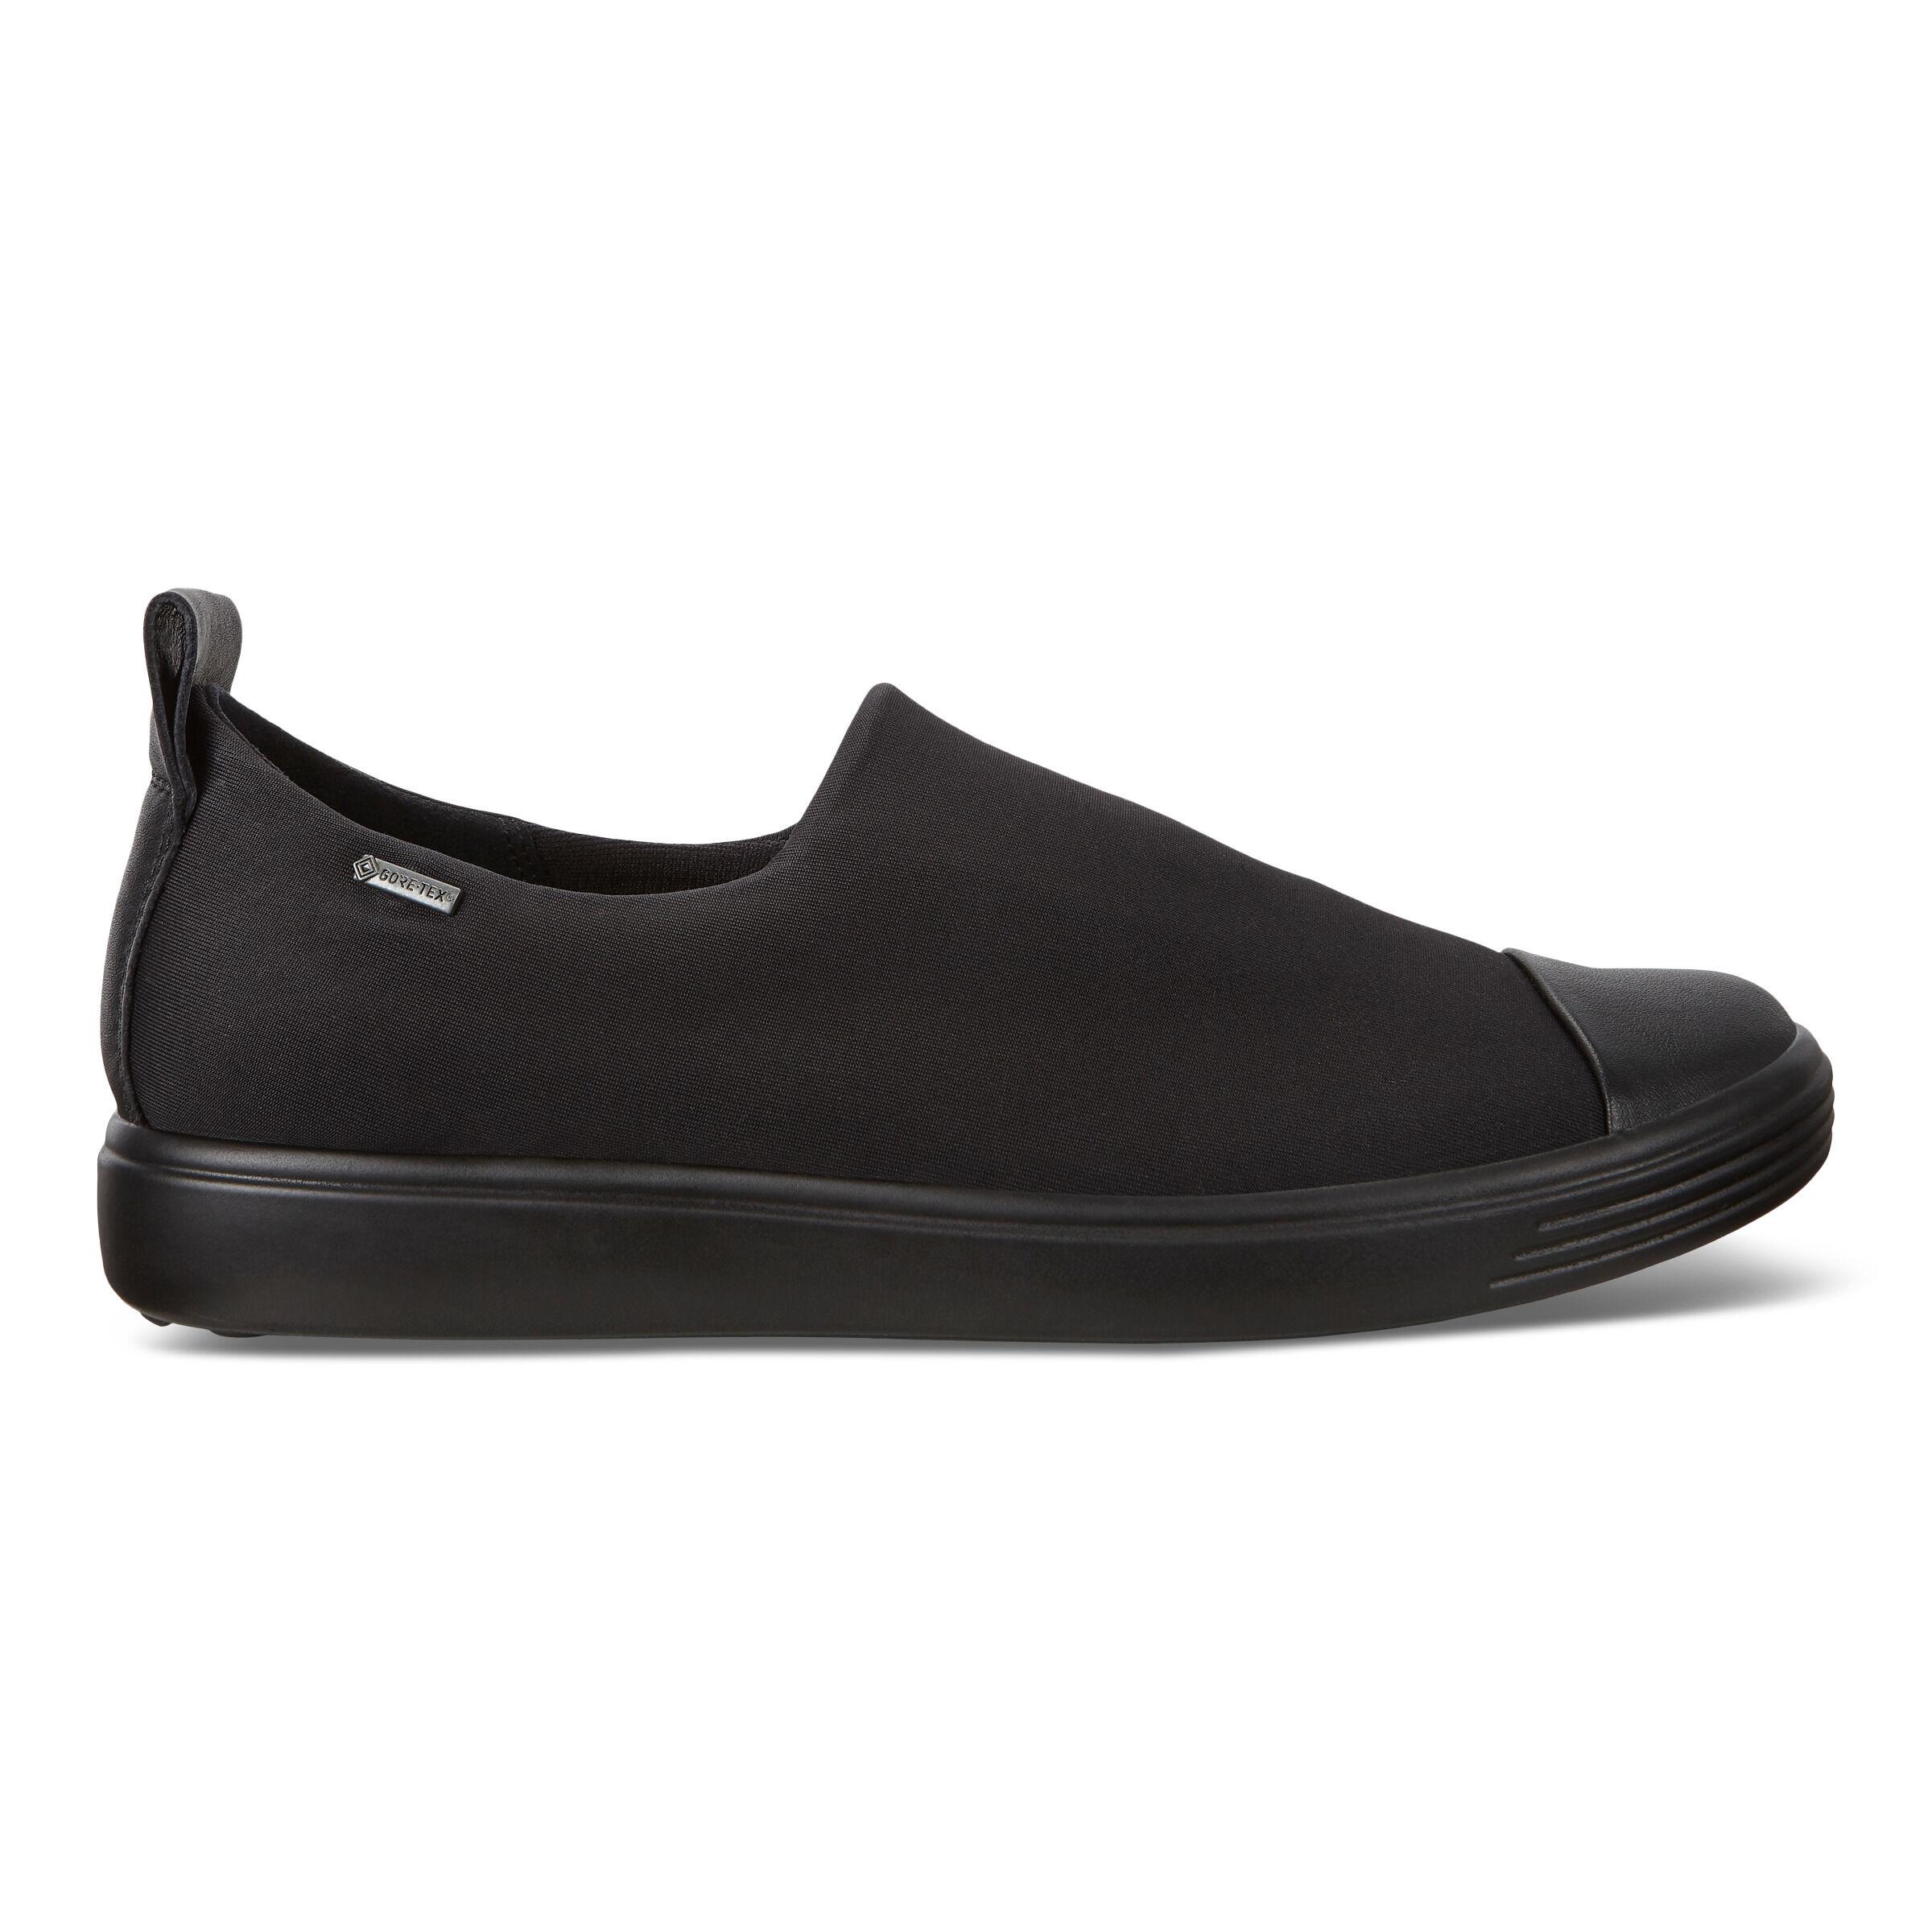 ECCO Soft 7 Womens Slip-on Sneaker